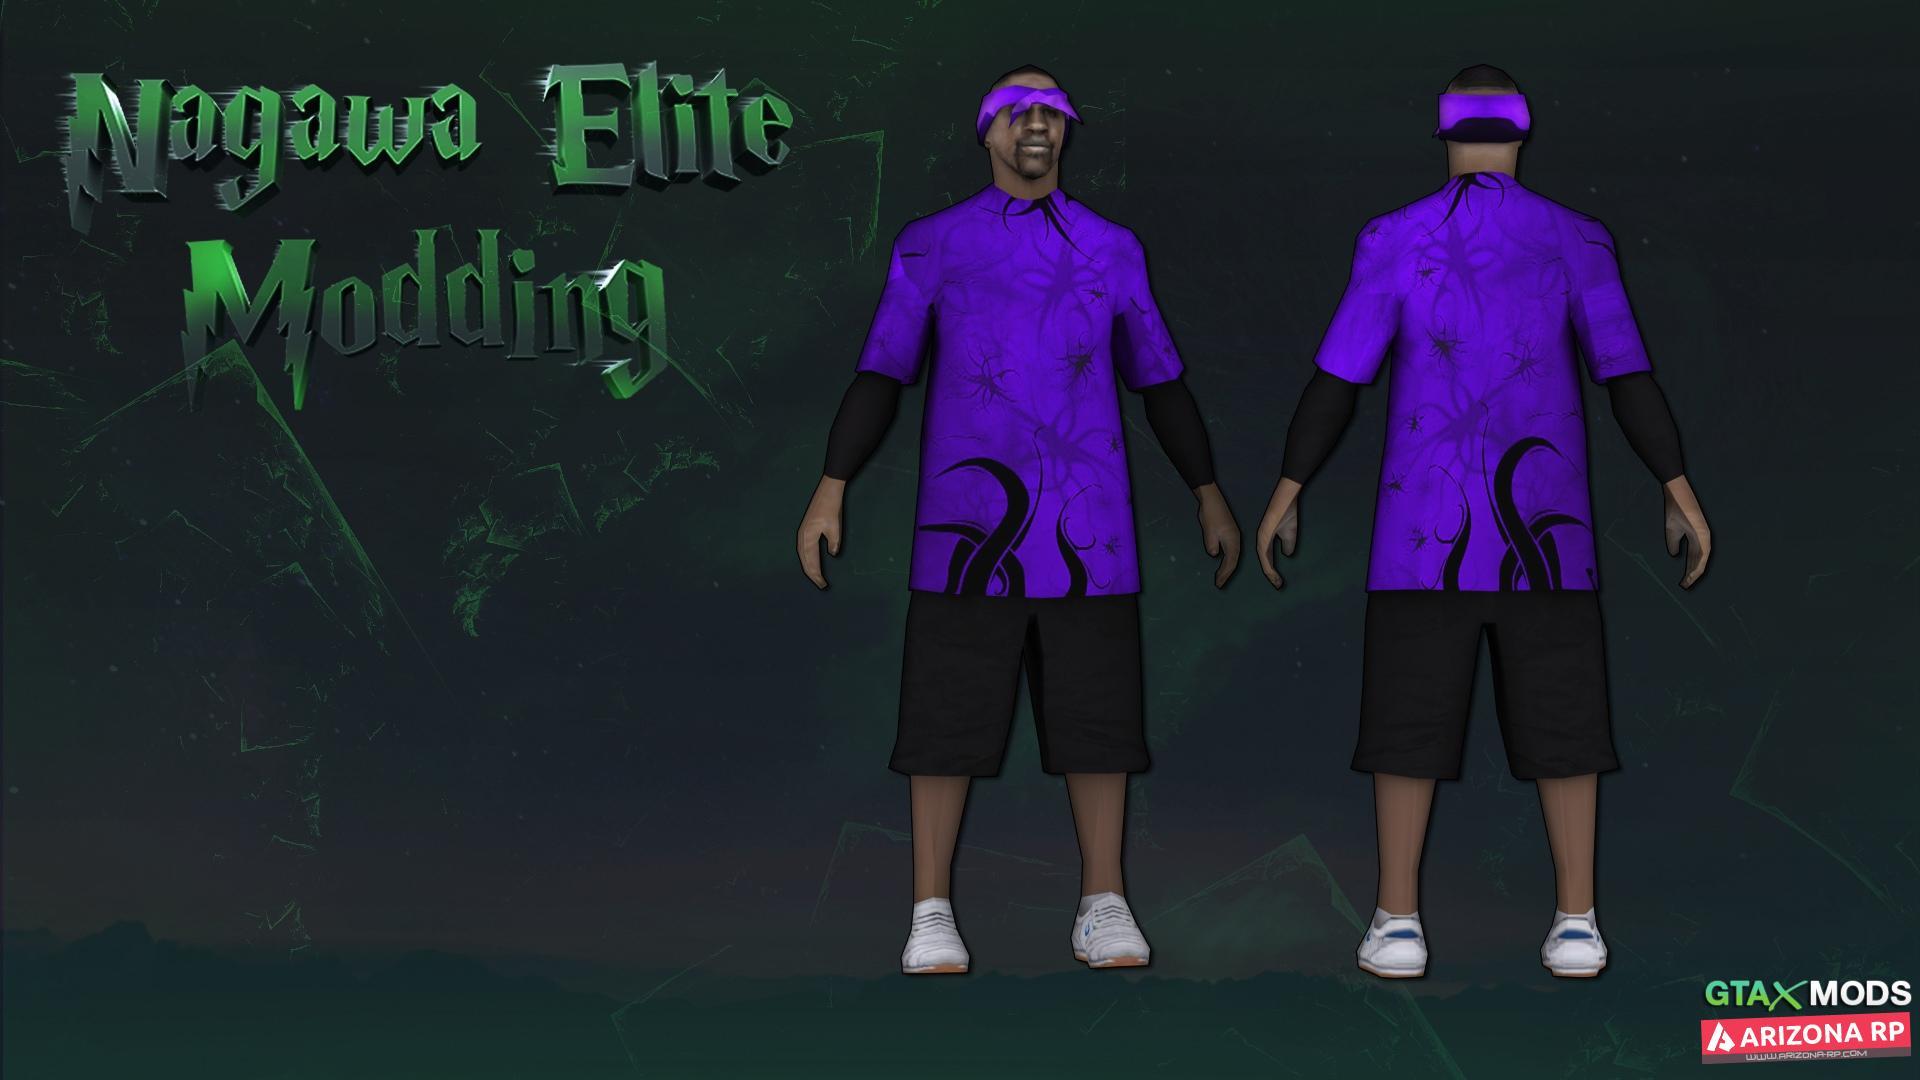 ballas1 | Nagawa Elite Dynasty